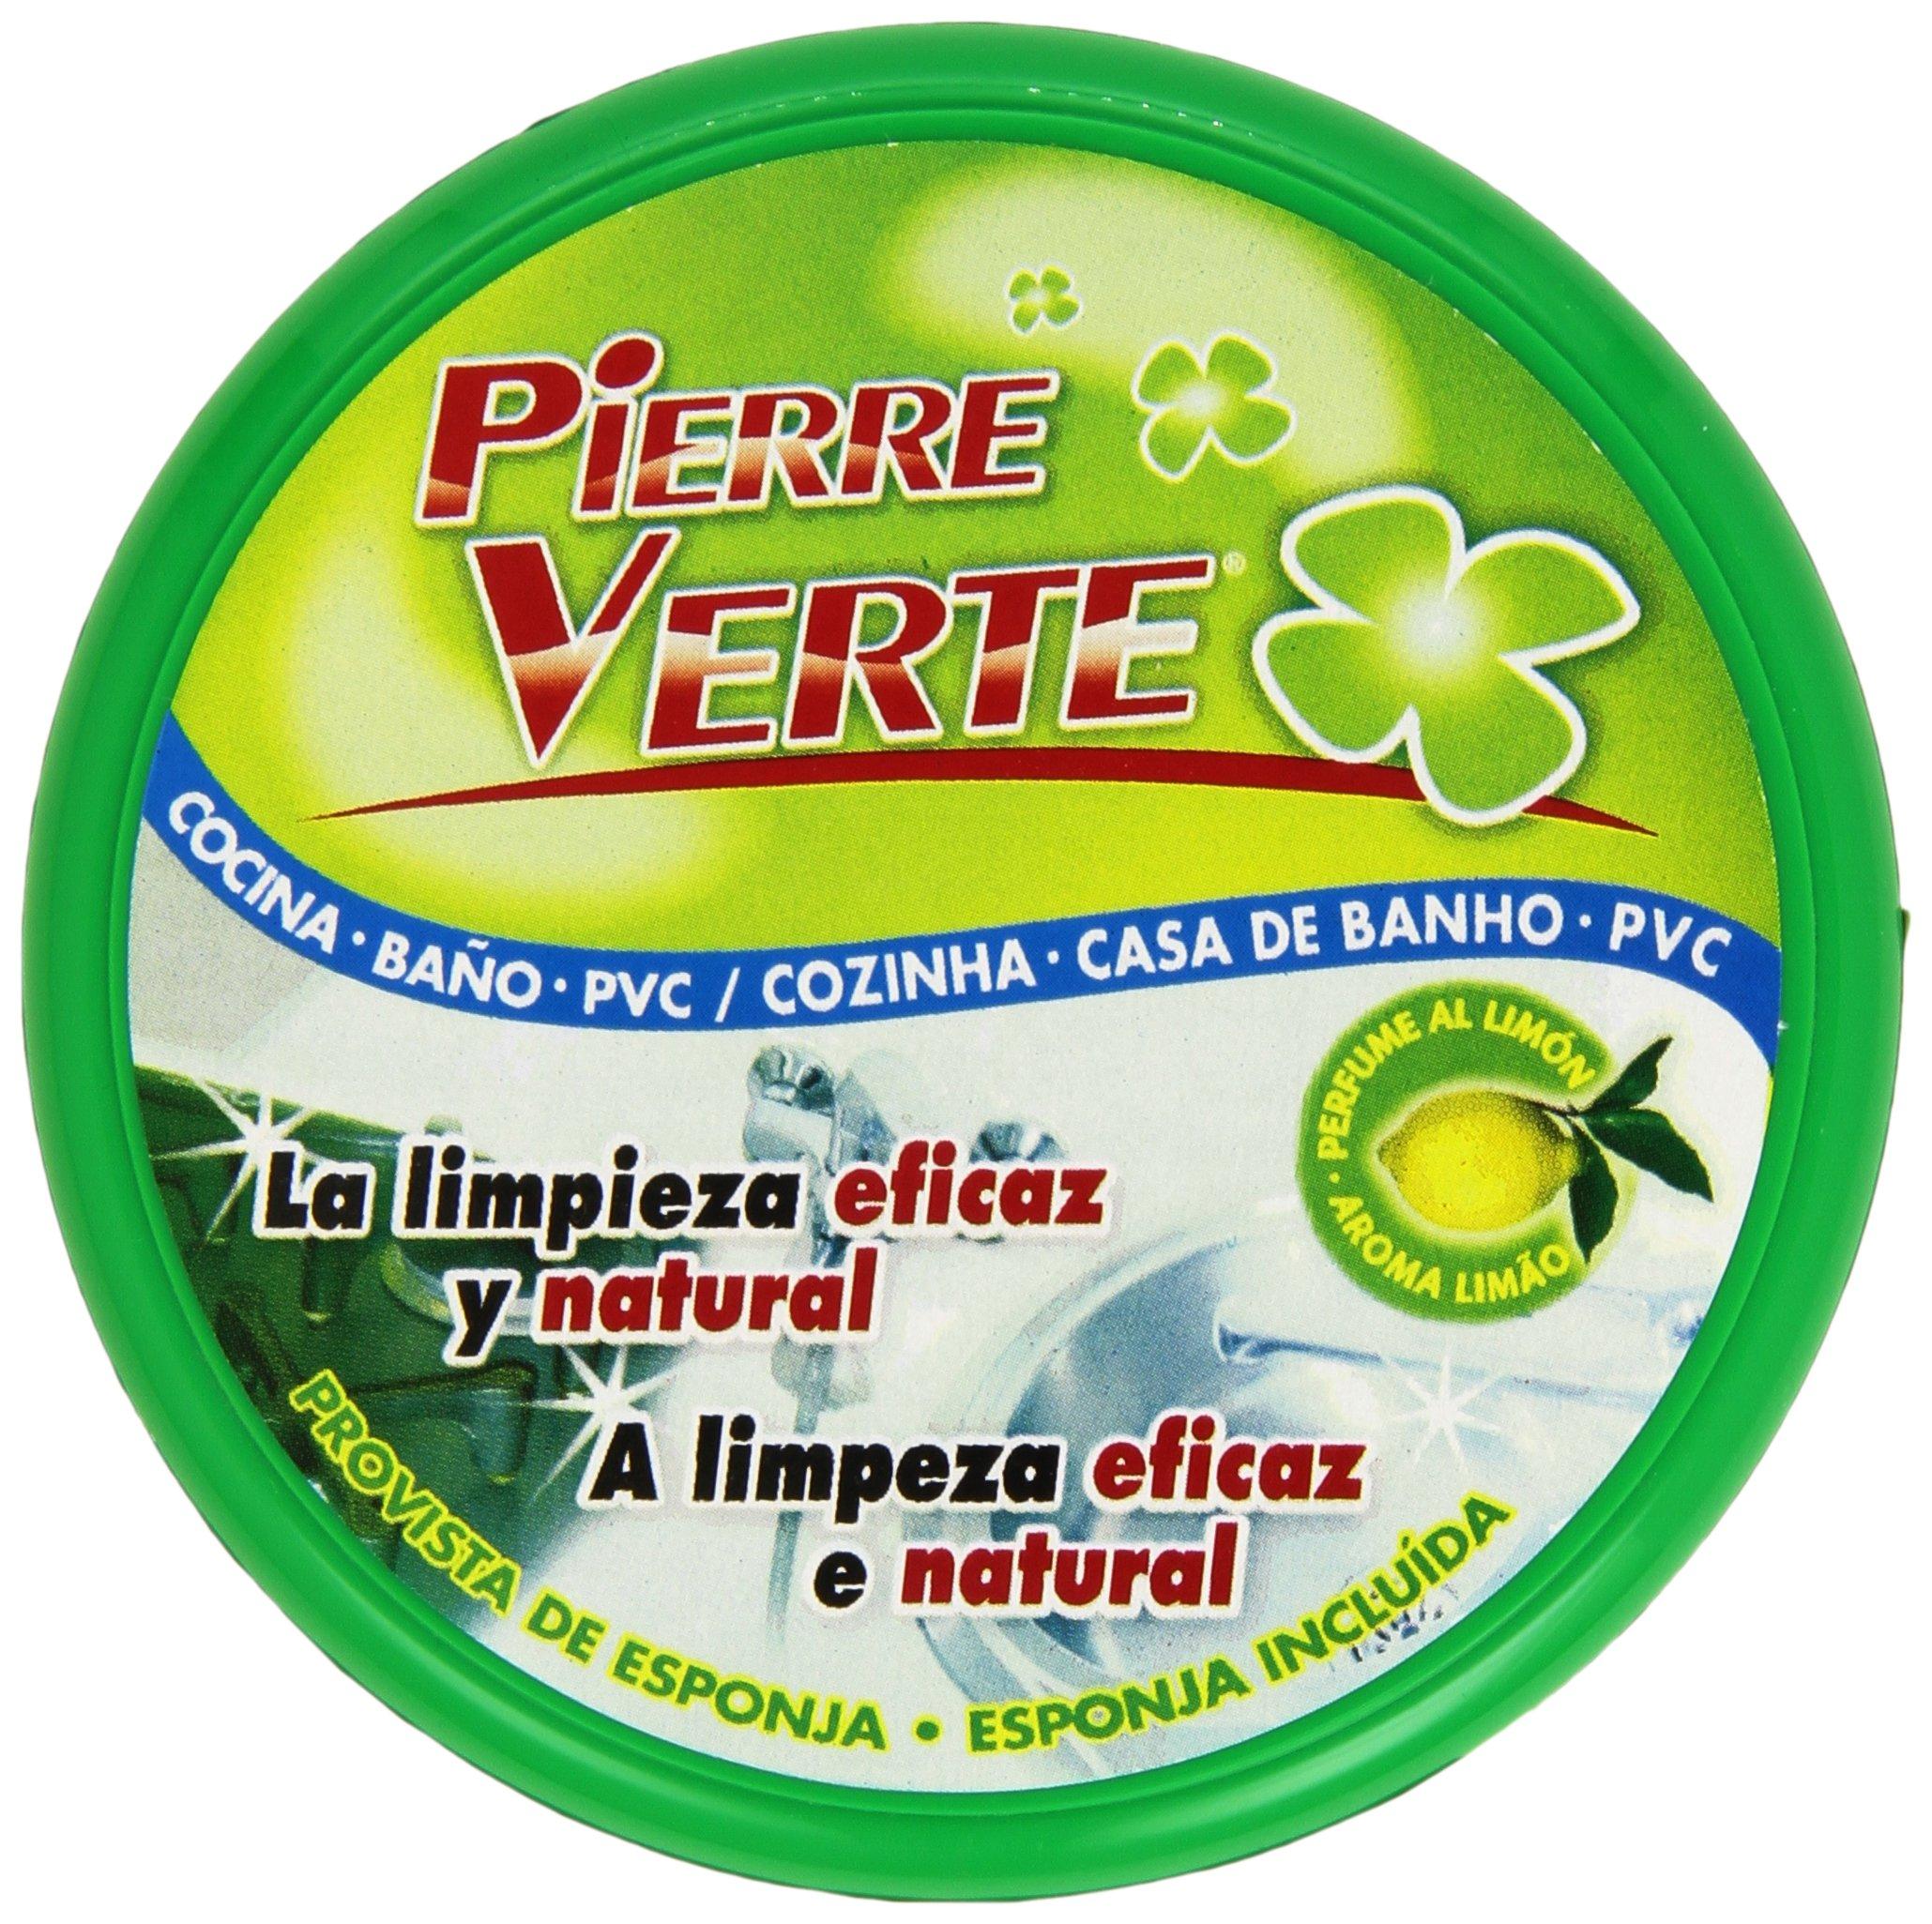 Passat Pierre Verte - Producto para limpieza, 200 g product image